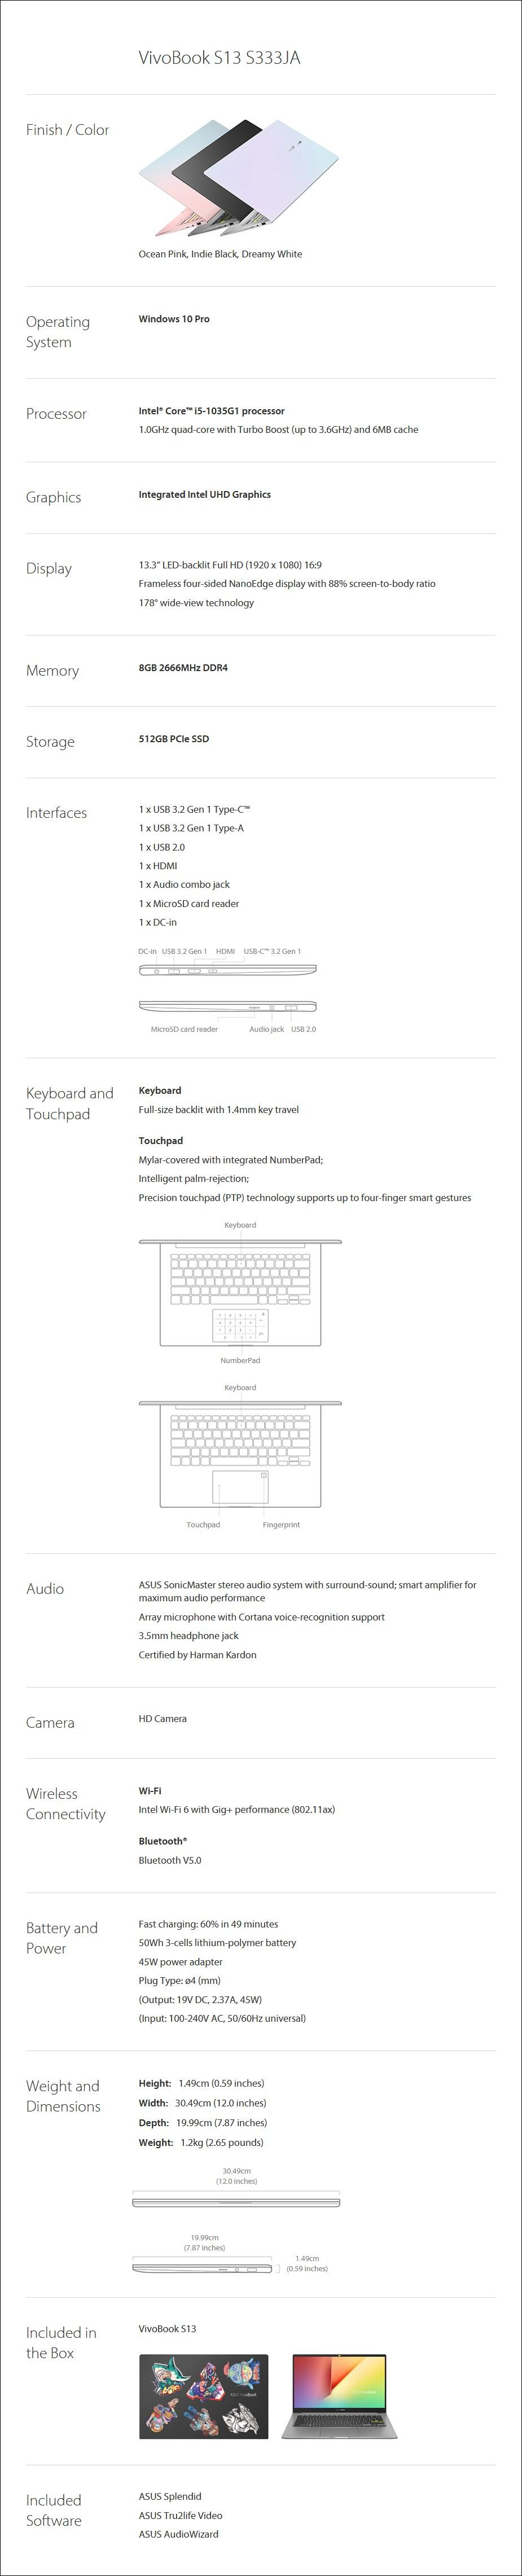 "ASUS VivoBook S13 S333JA 13.3"" Laptop i5-10351G1 8GB 512GB W10P - Overview 2"